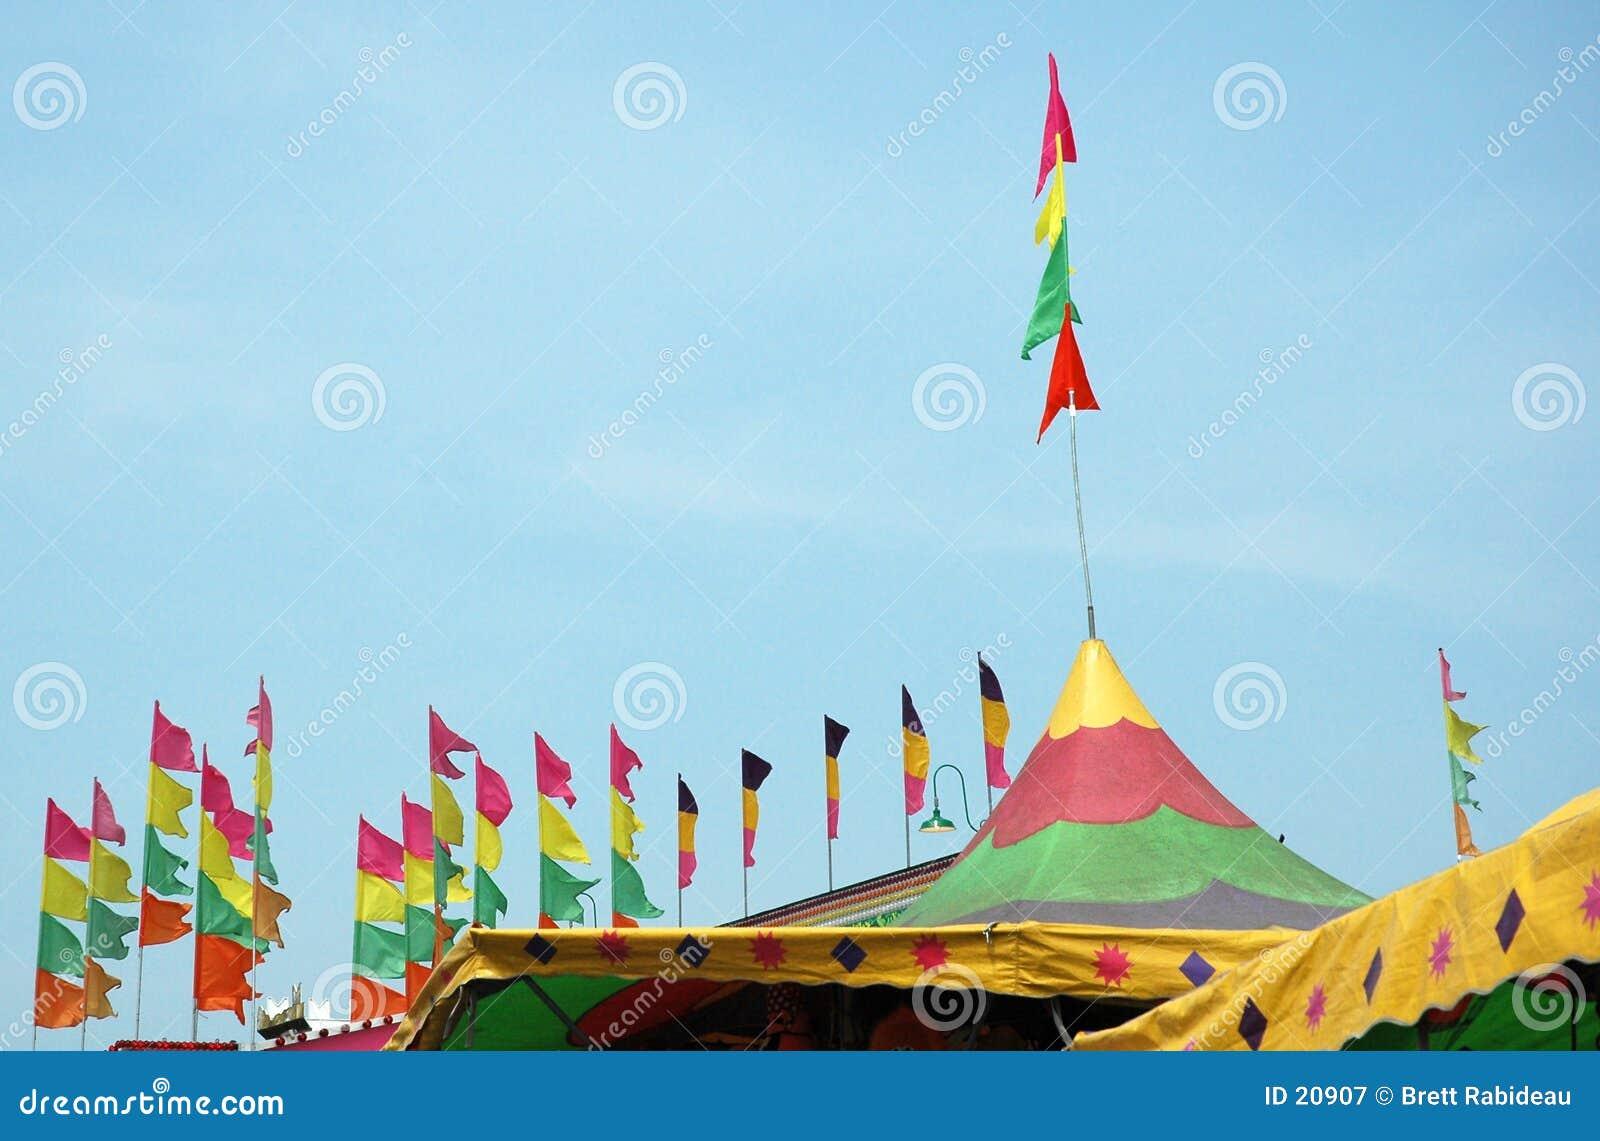 Dessus de tente de festival